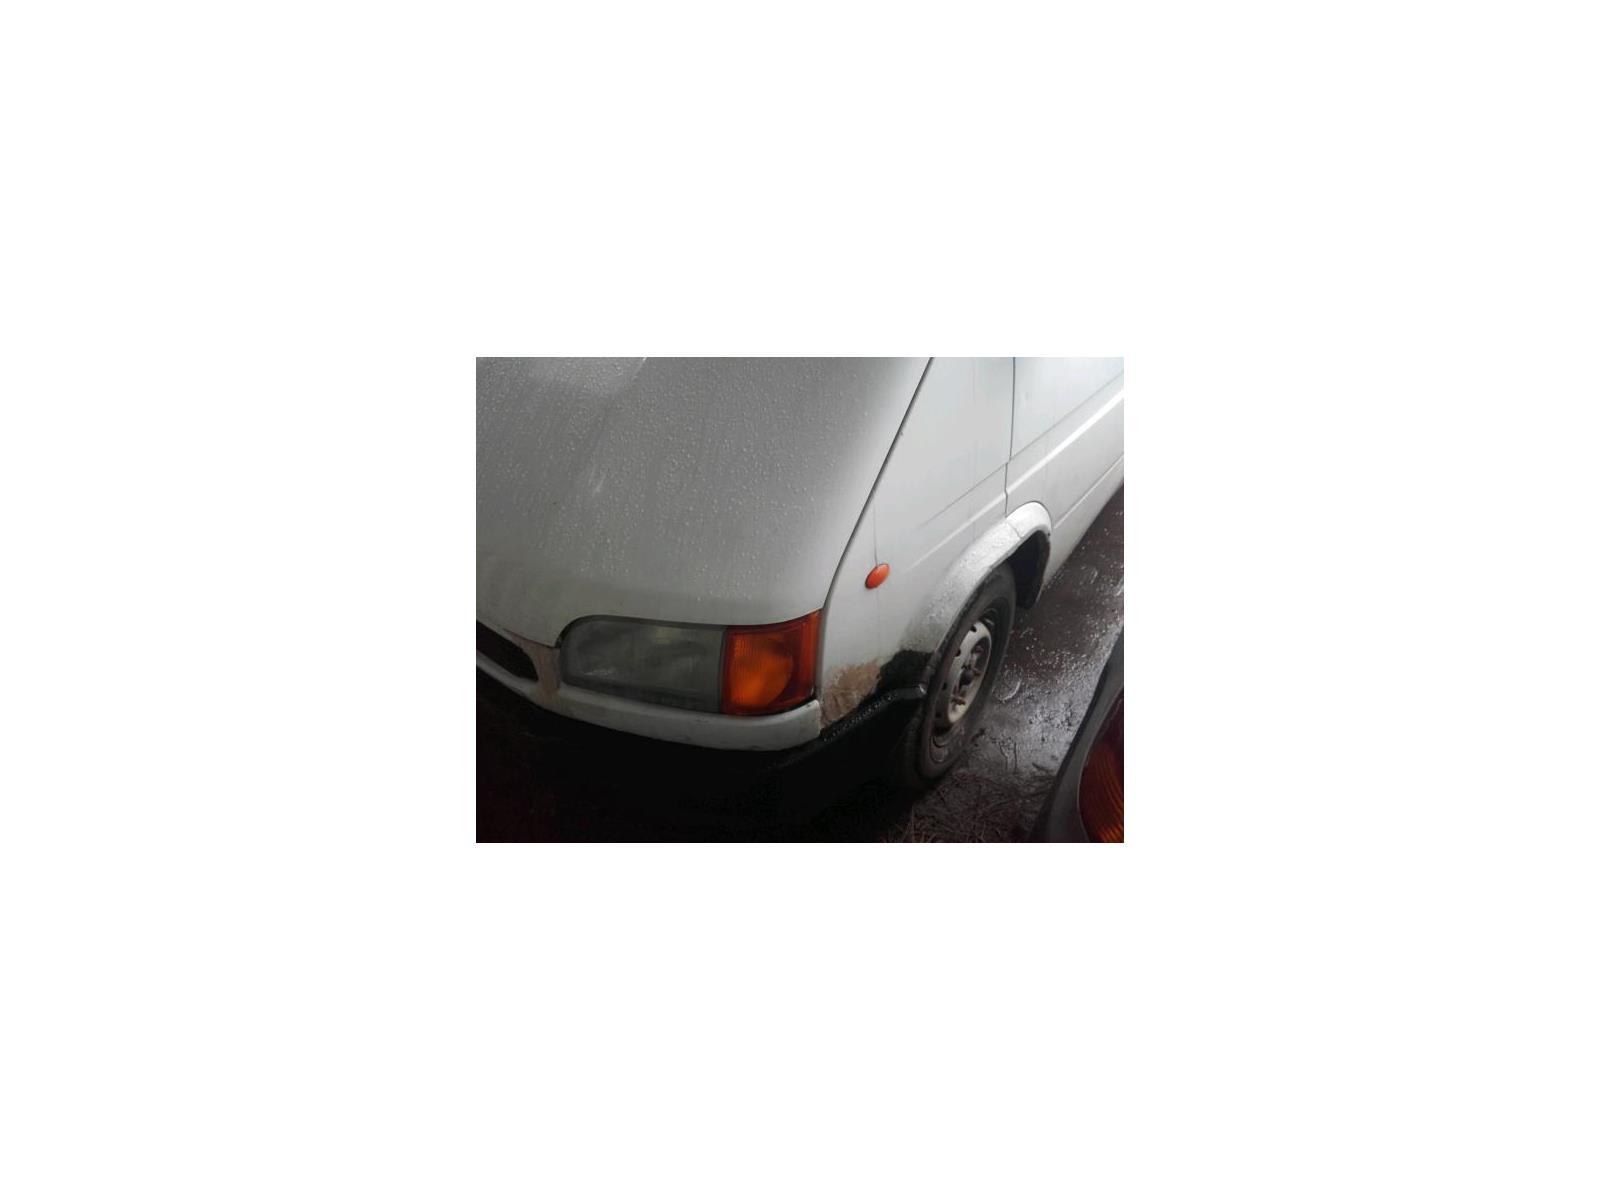 1998 ford escort parts manual